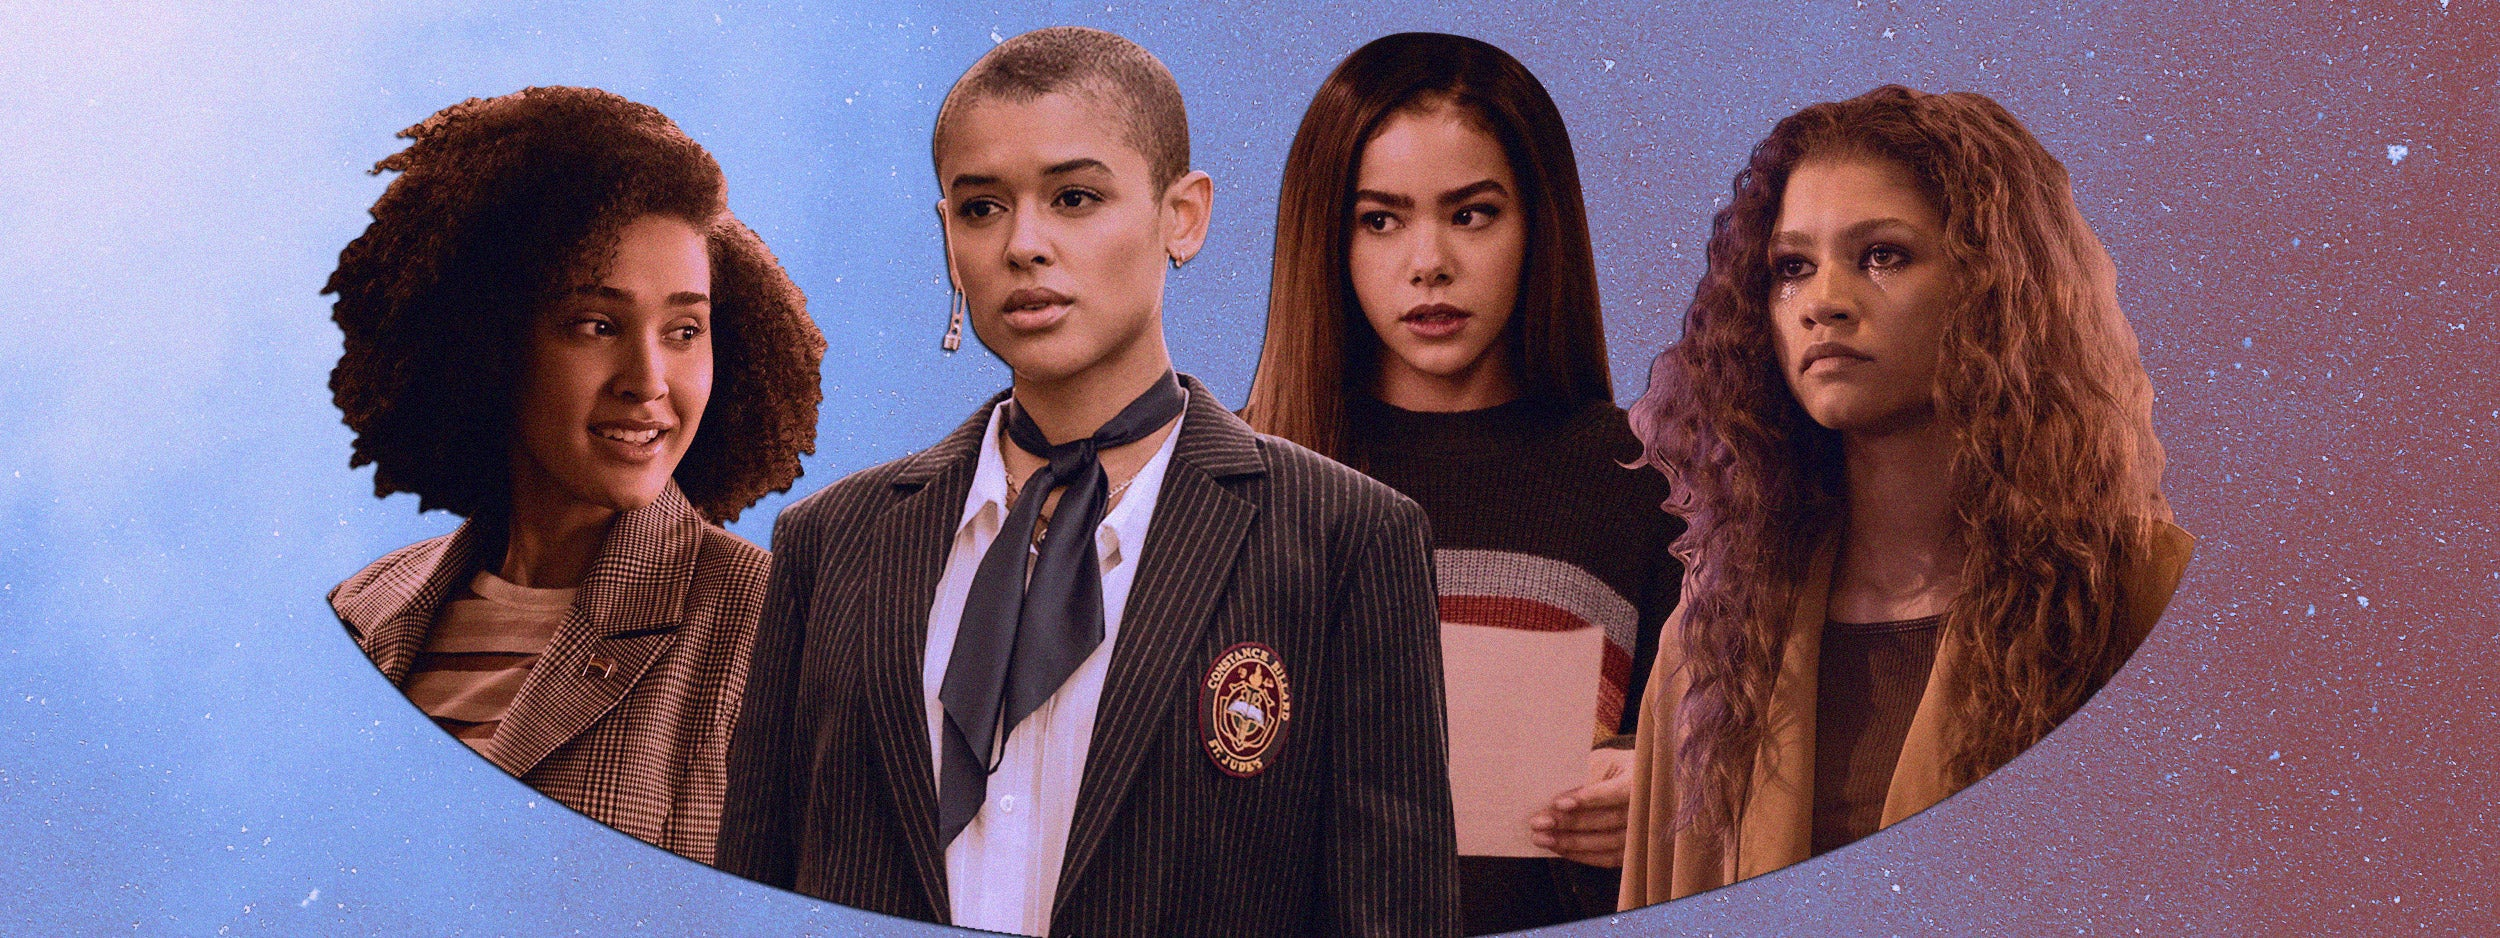 Ginny & Georgia, Bridgerton, Gossip Girl: Hollywood-Serien haben ein Colorismus-Problem